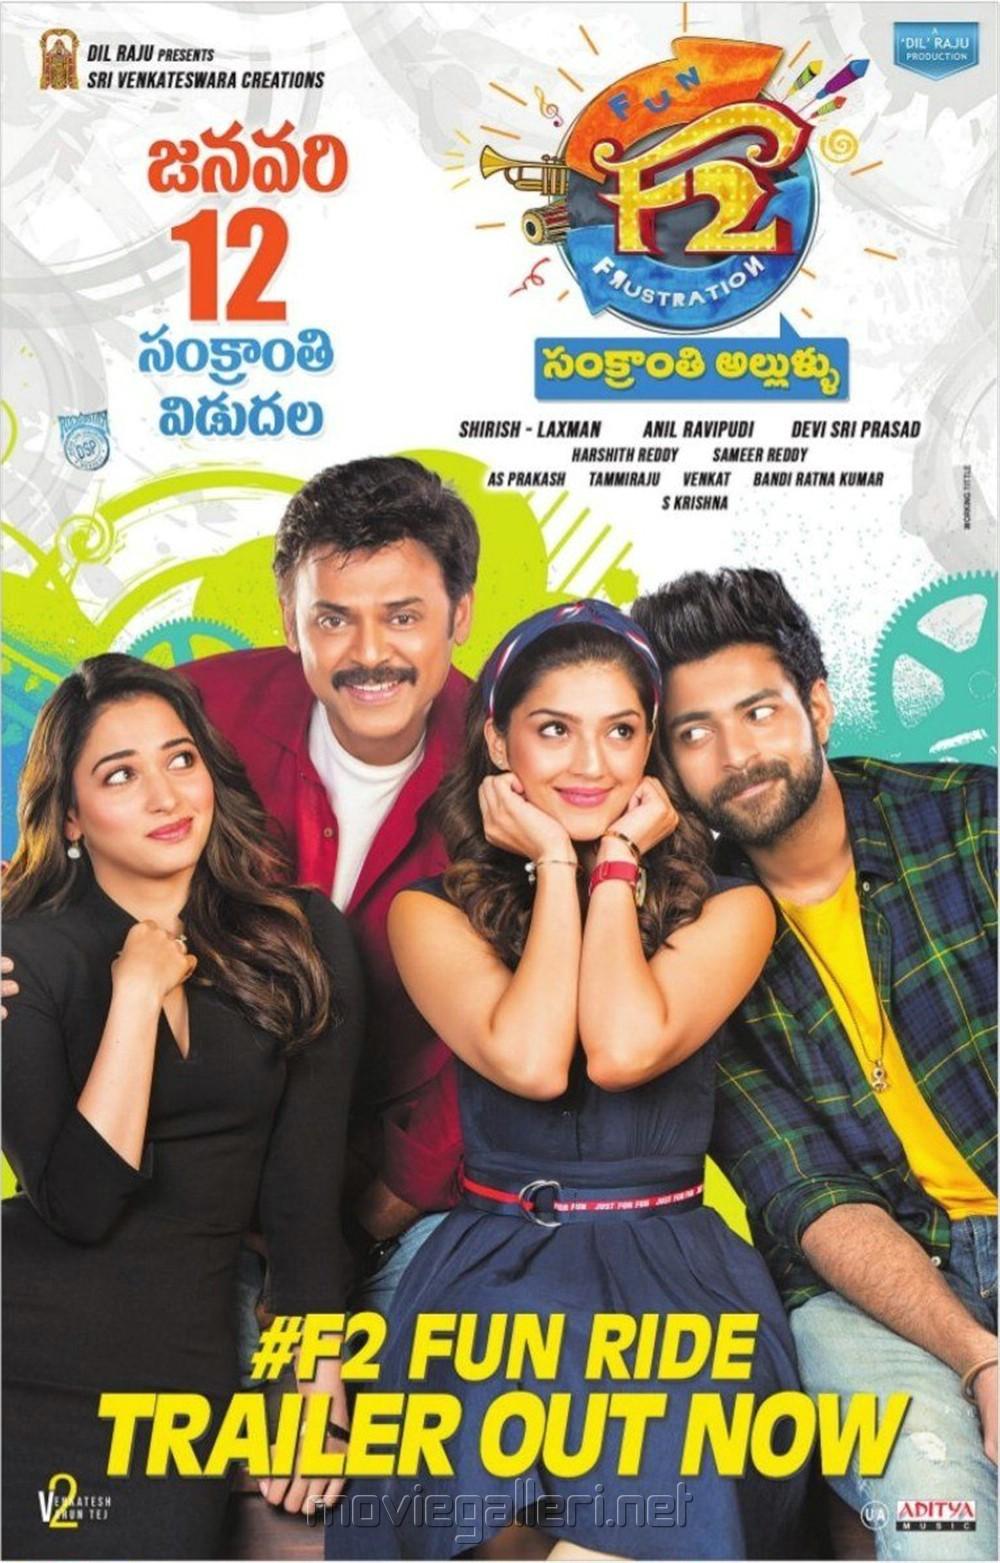 F2 Fun and Frustration 2019 Telugu Proper 400MB HDRip 480p x264 Free